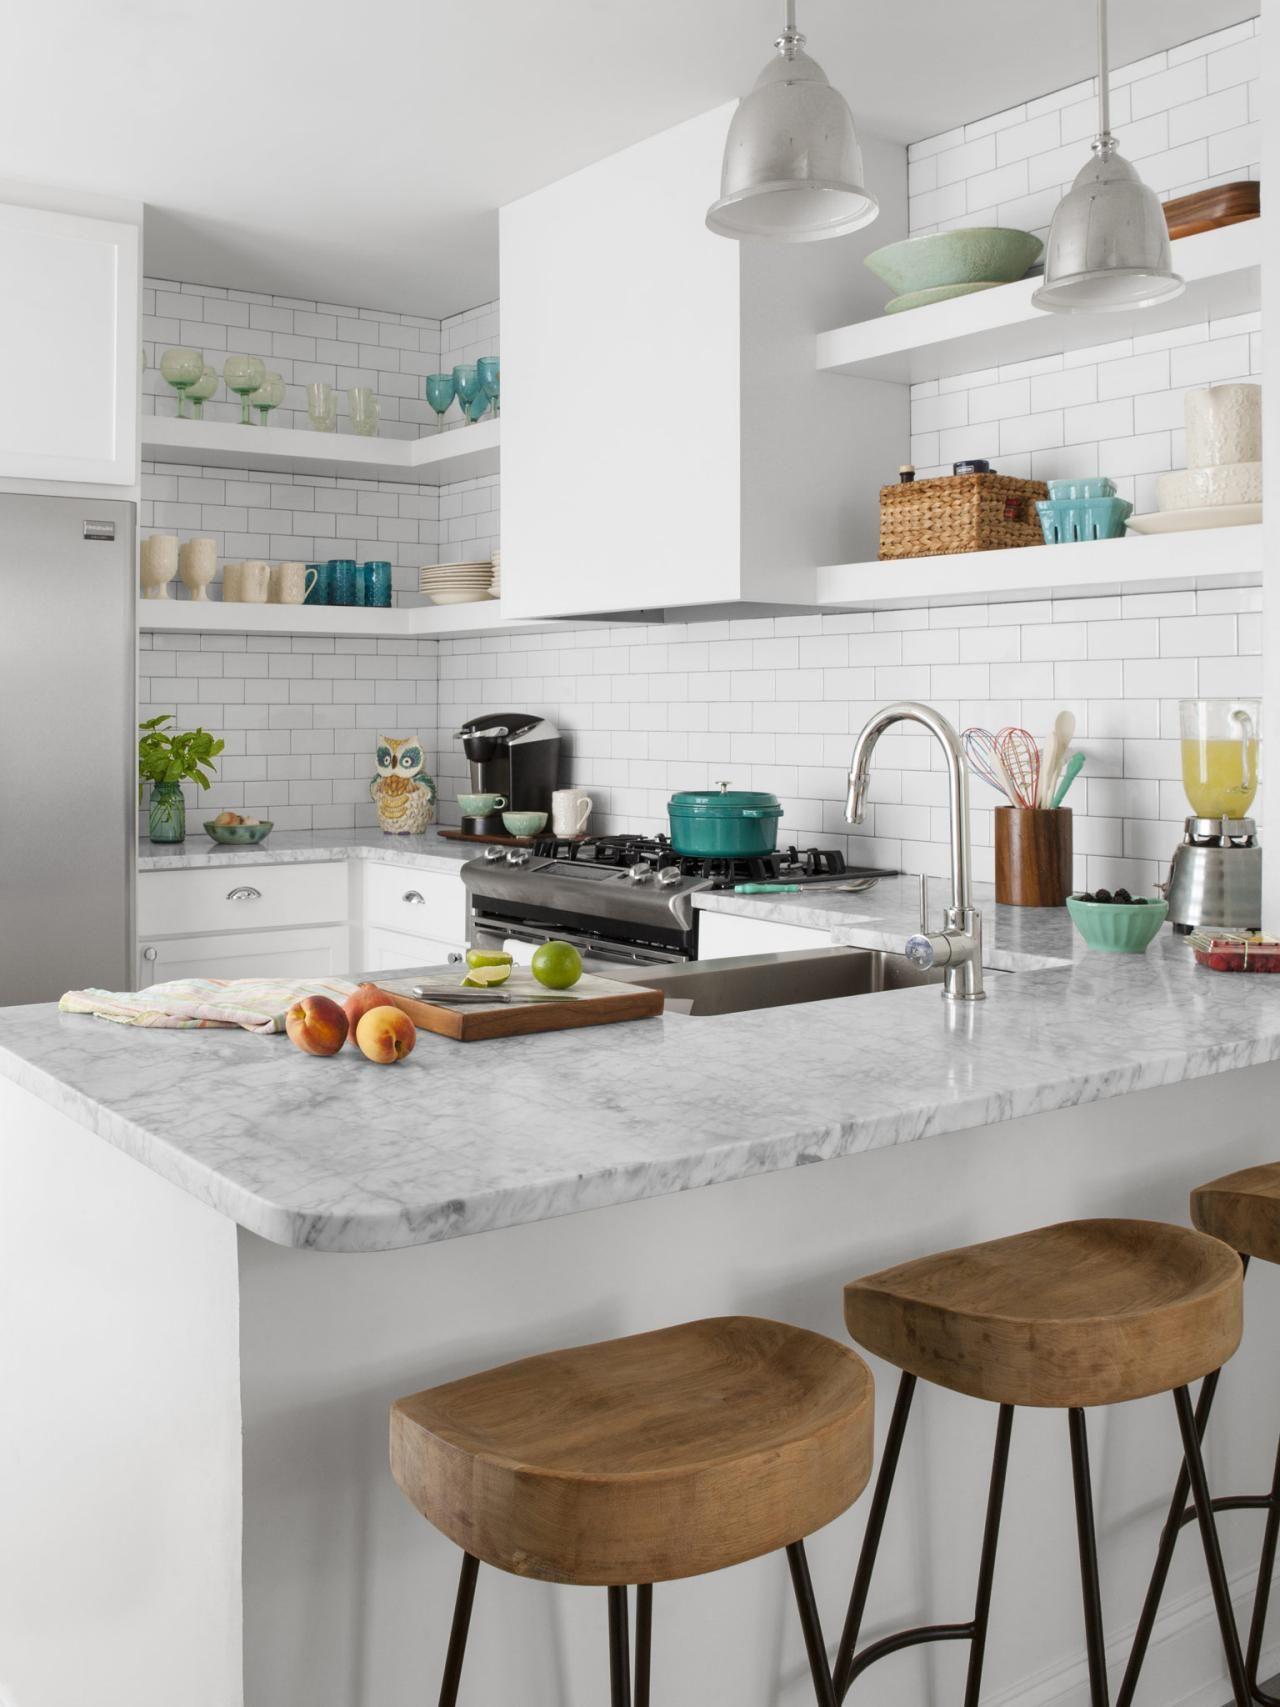 small space kitchen remodel kitchen ideas design with cabinets islands backsplashes hgtv on u kitchen ideas small id=75791